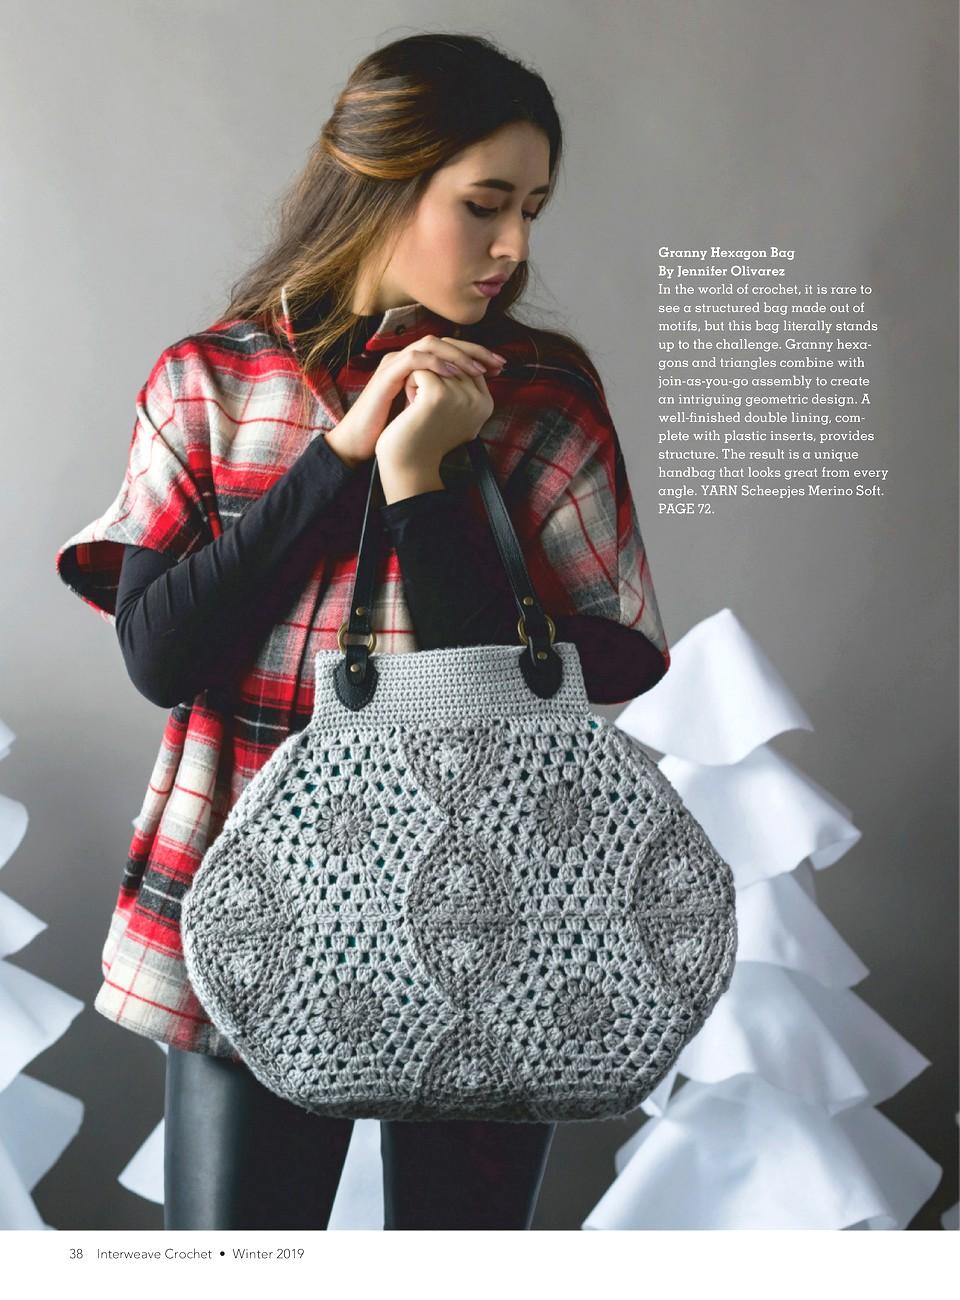 Interweave Crochet Winter 2019-39